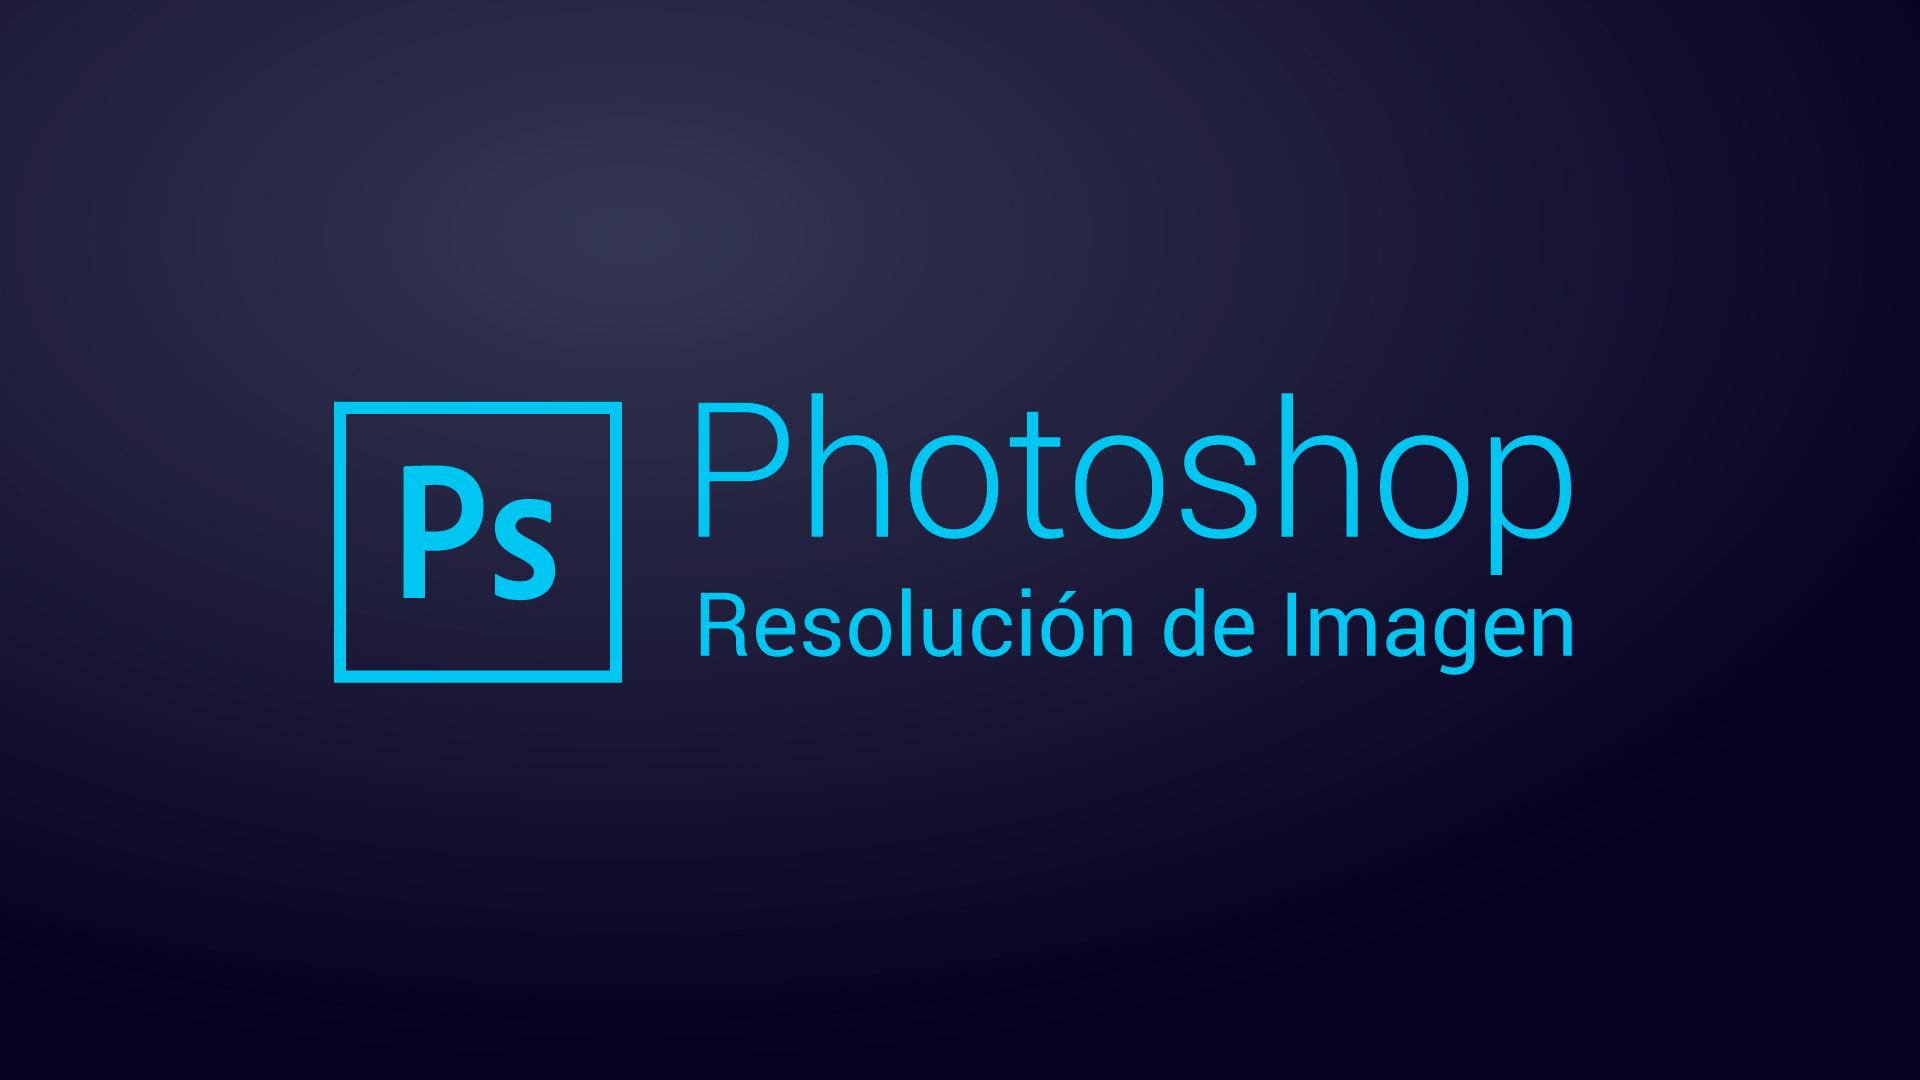 1001.graphics-photoshop-resolucion-1_kopoaz.jpg